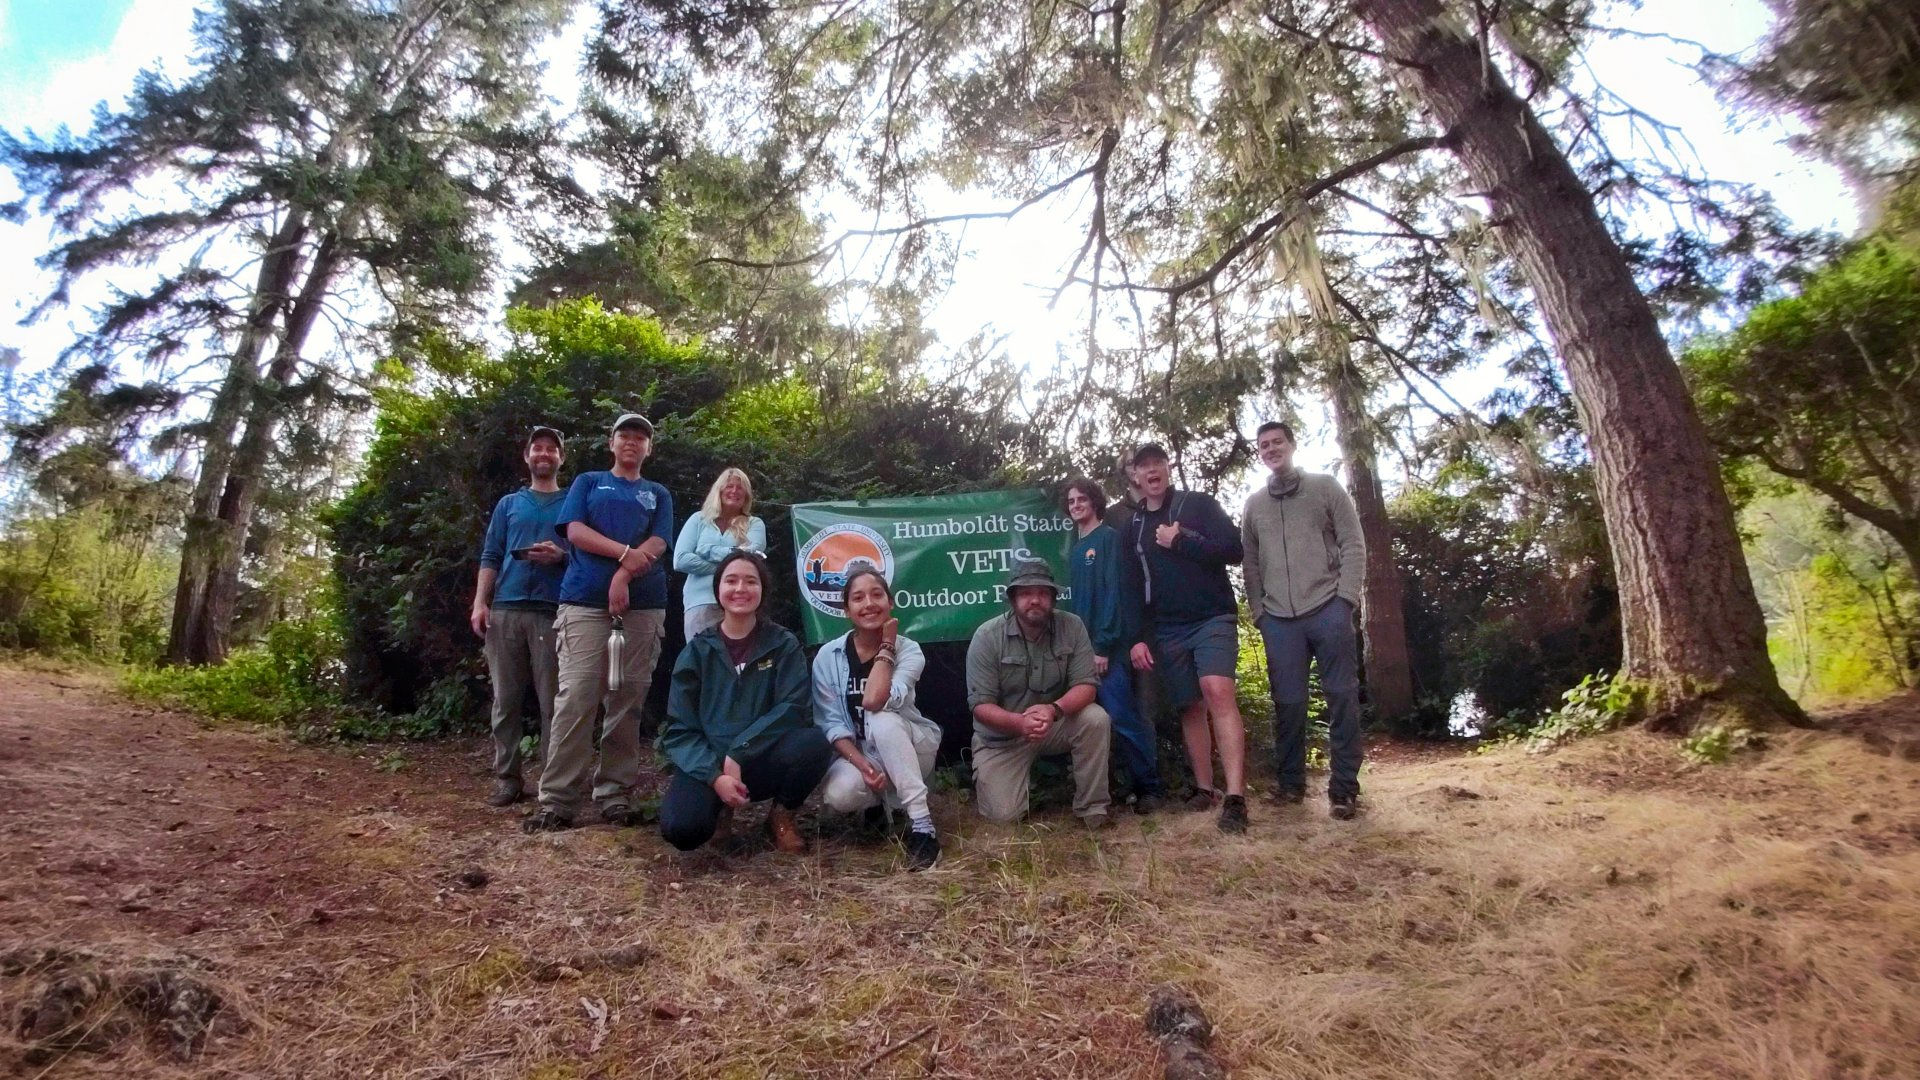 Humboldt State Veterans Enrollment and Transition Services' Outdoor program orientation. | Photo courtesy HSU VETS